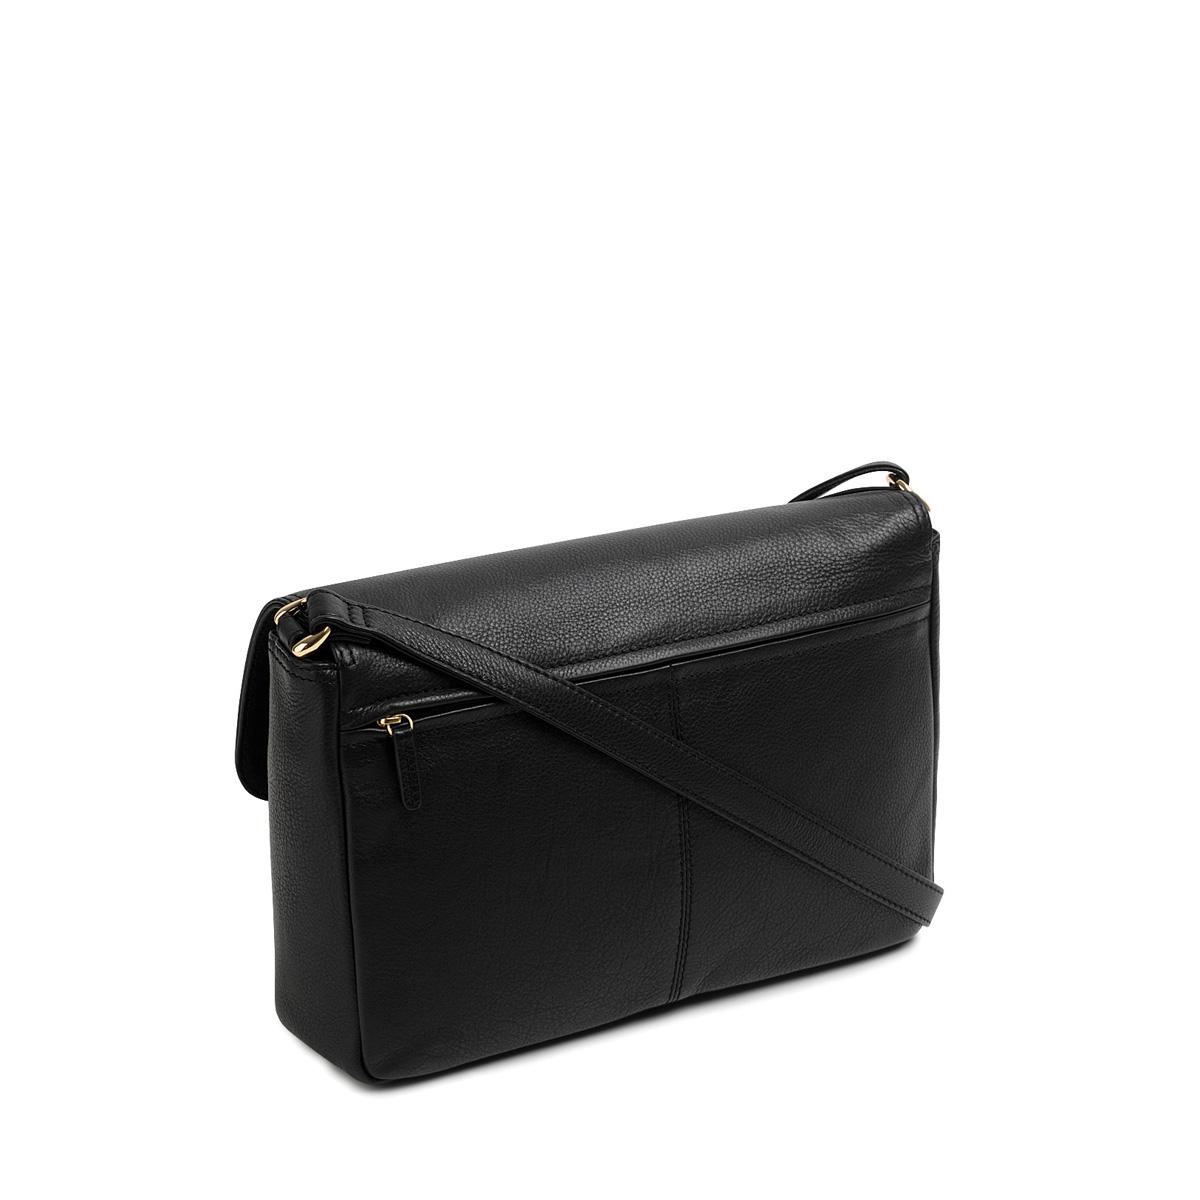 92f20725e8 Tula Black Nappa Originals Medium Flapover Cross Body Bag